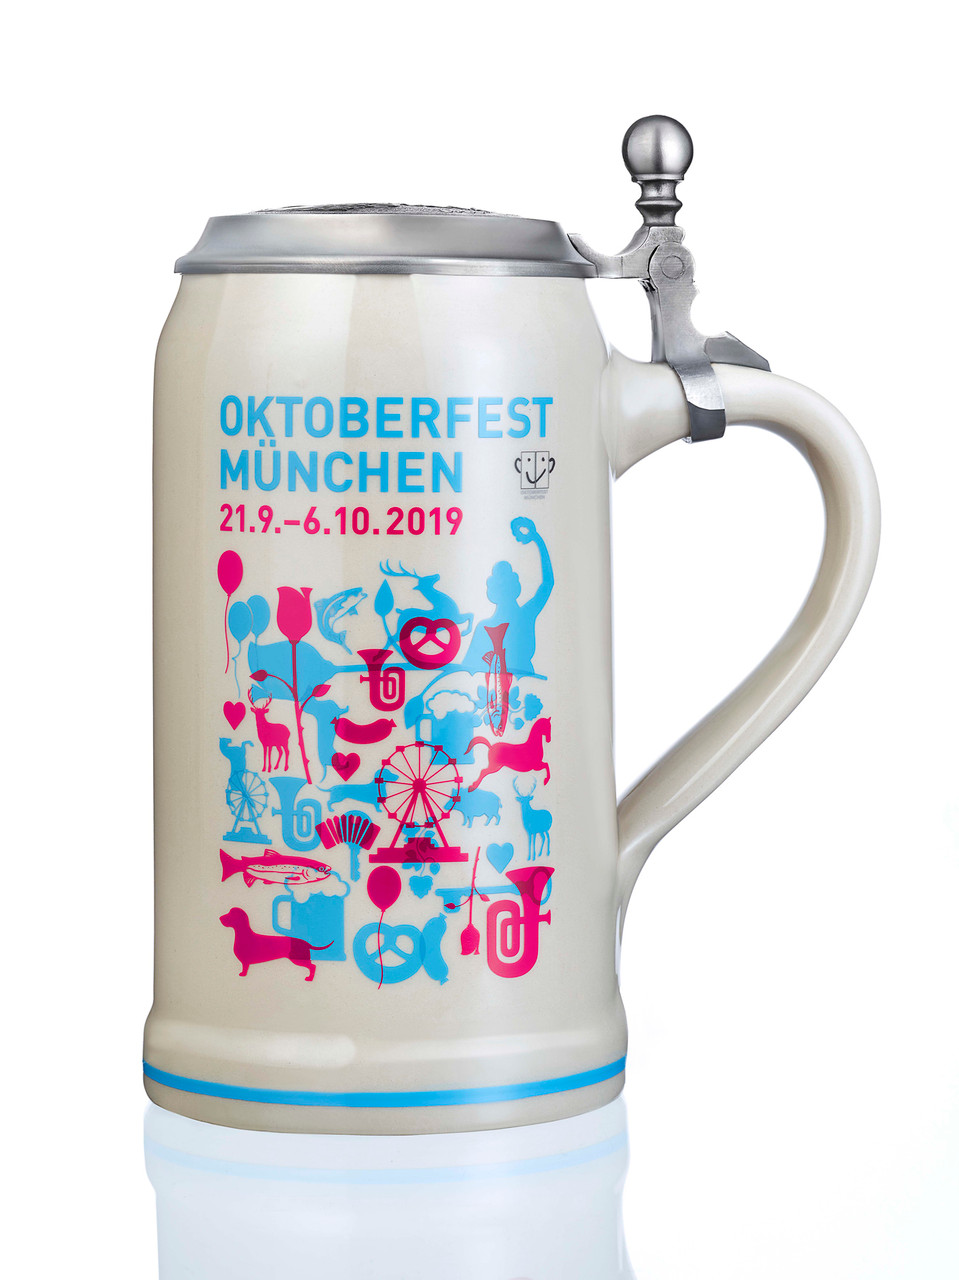 Munich 2019 Official Oktoberfest Beer Stein